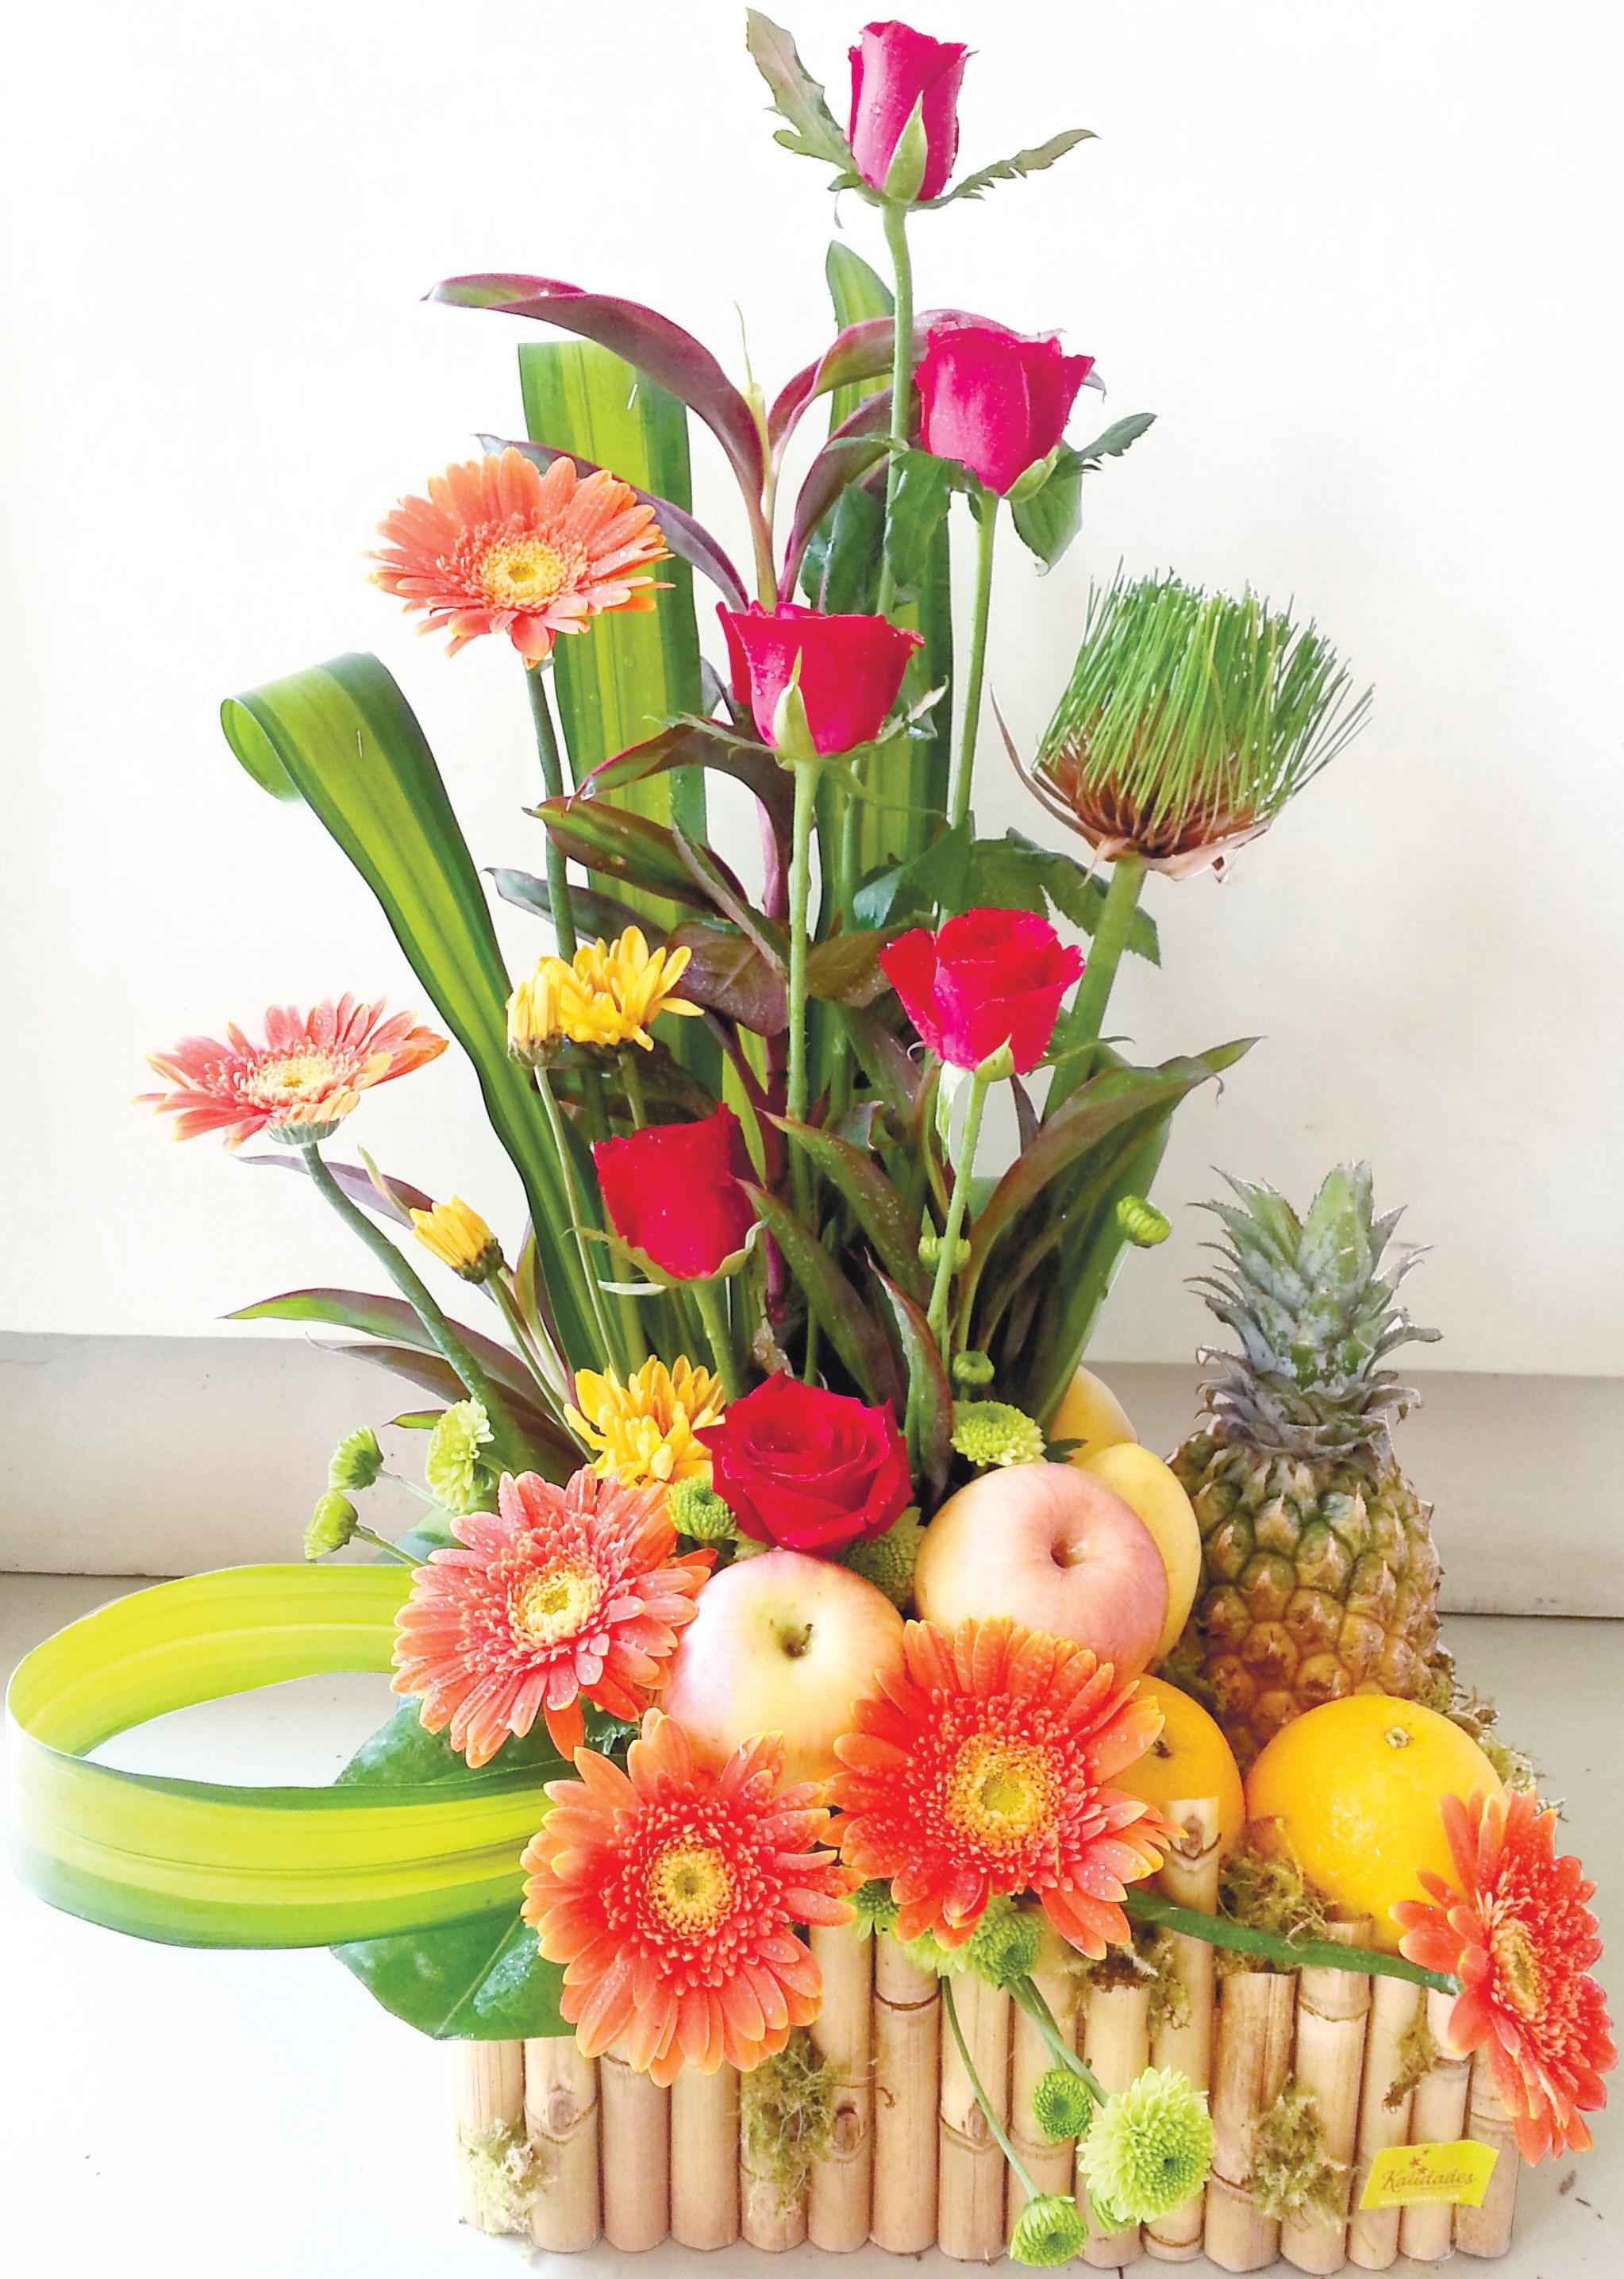 Kalidades House of Flowers - Best Florist